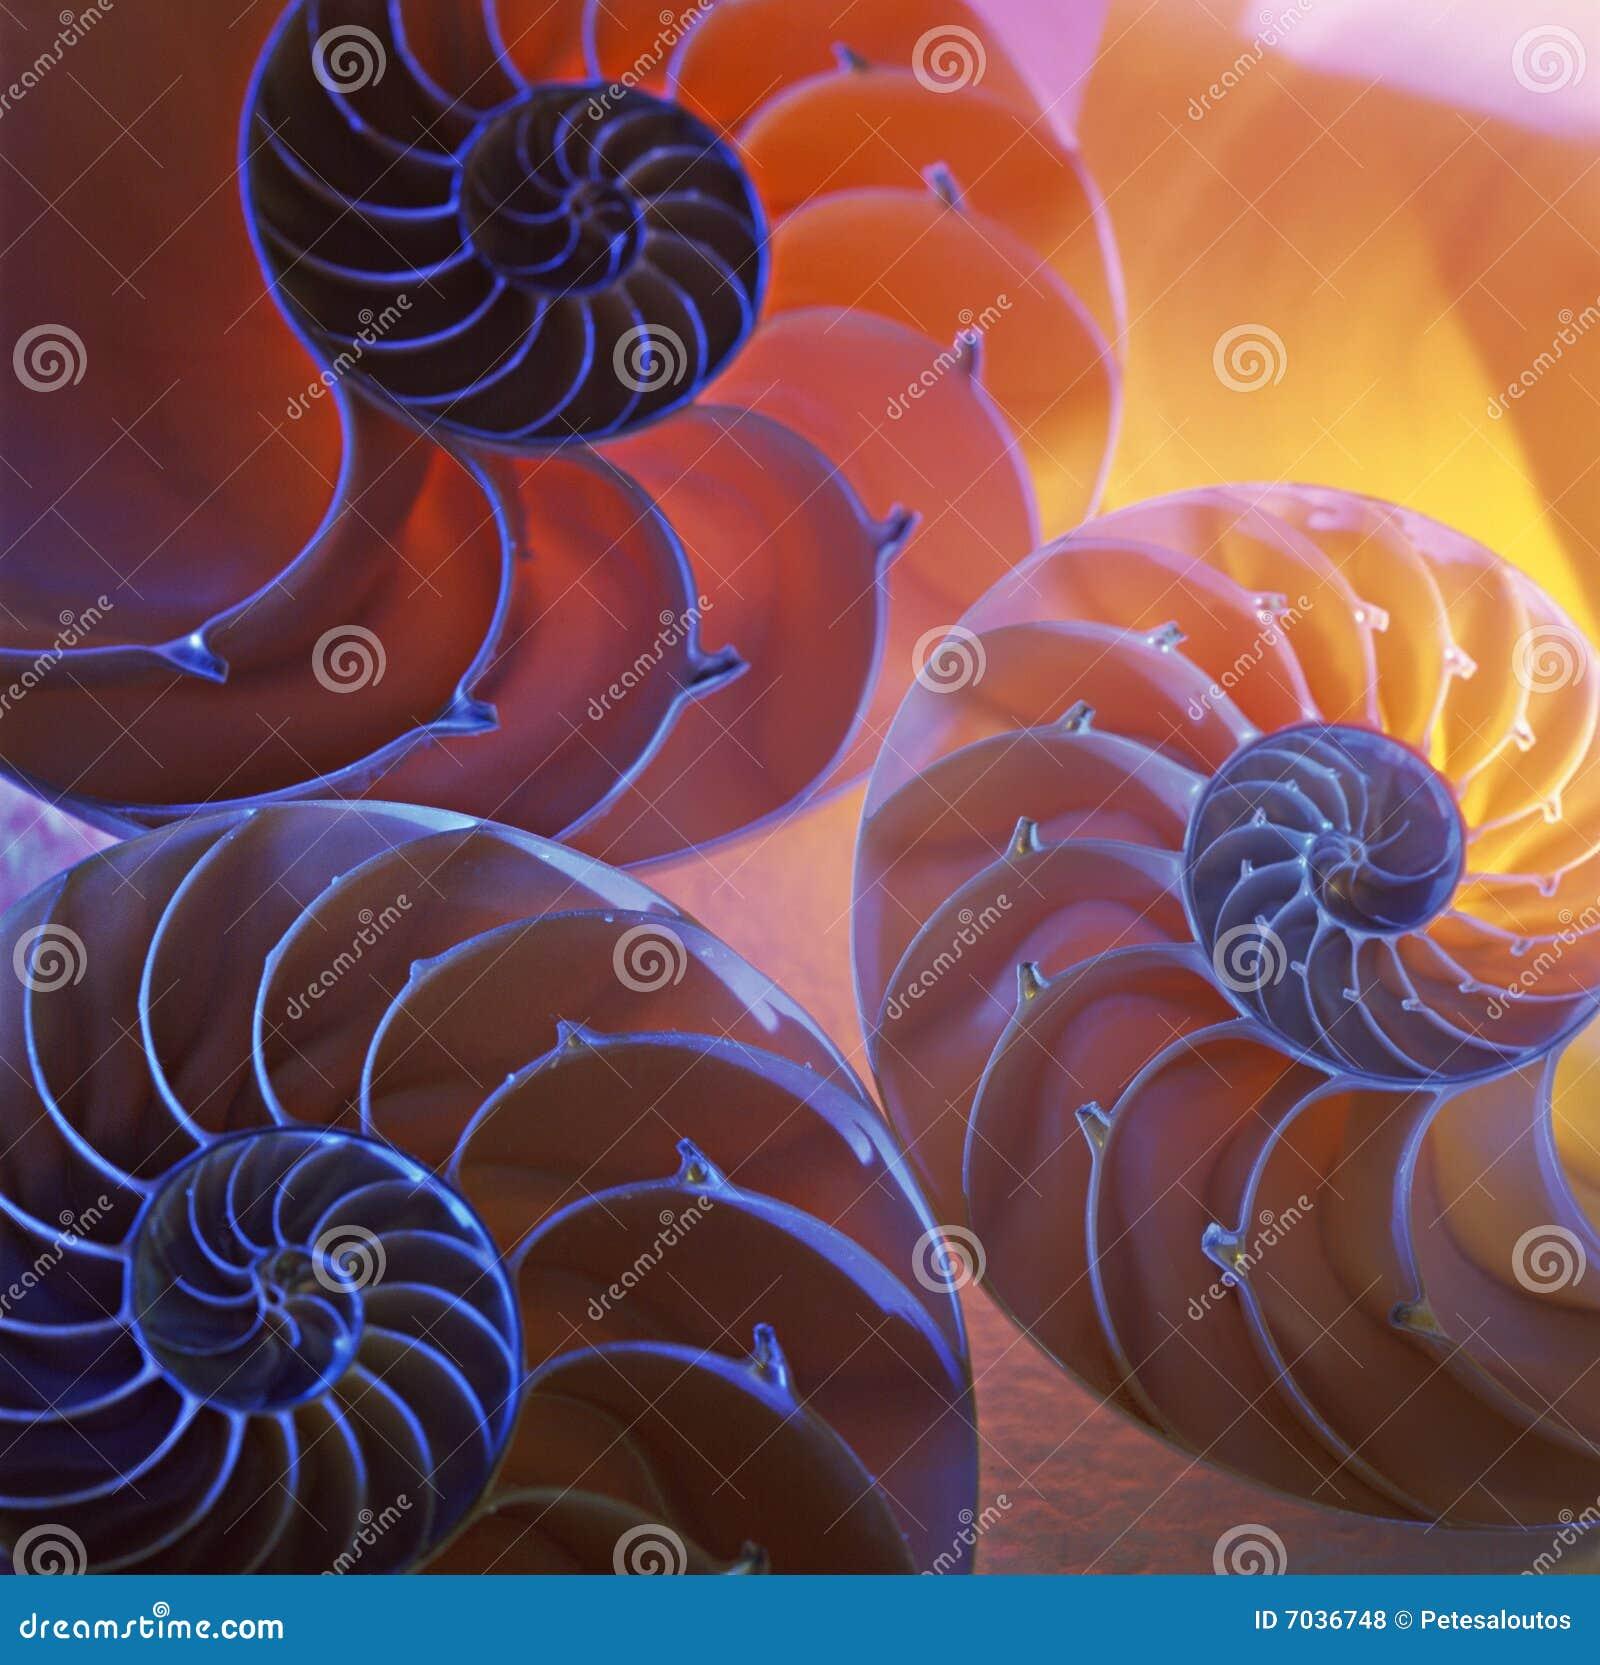 Nautilusshells